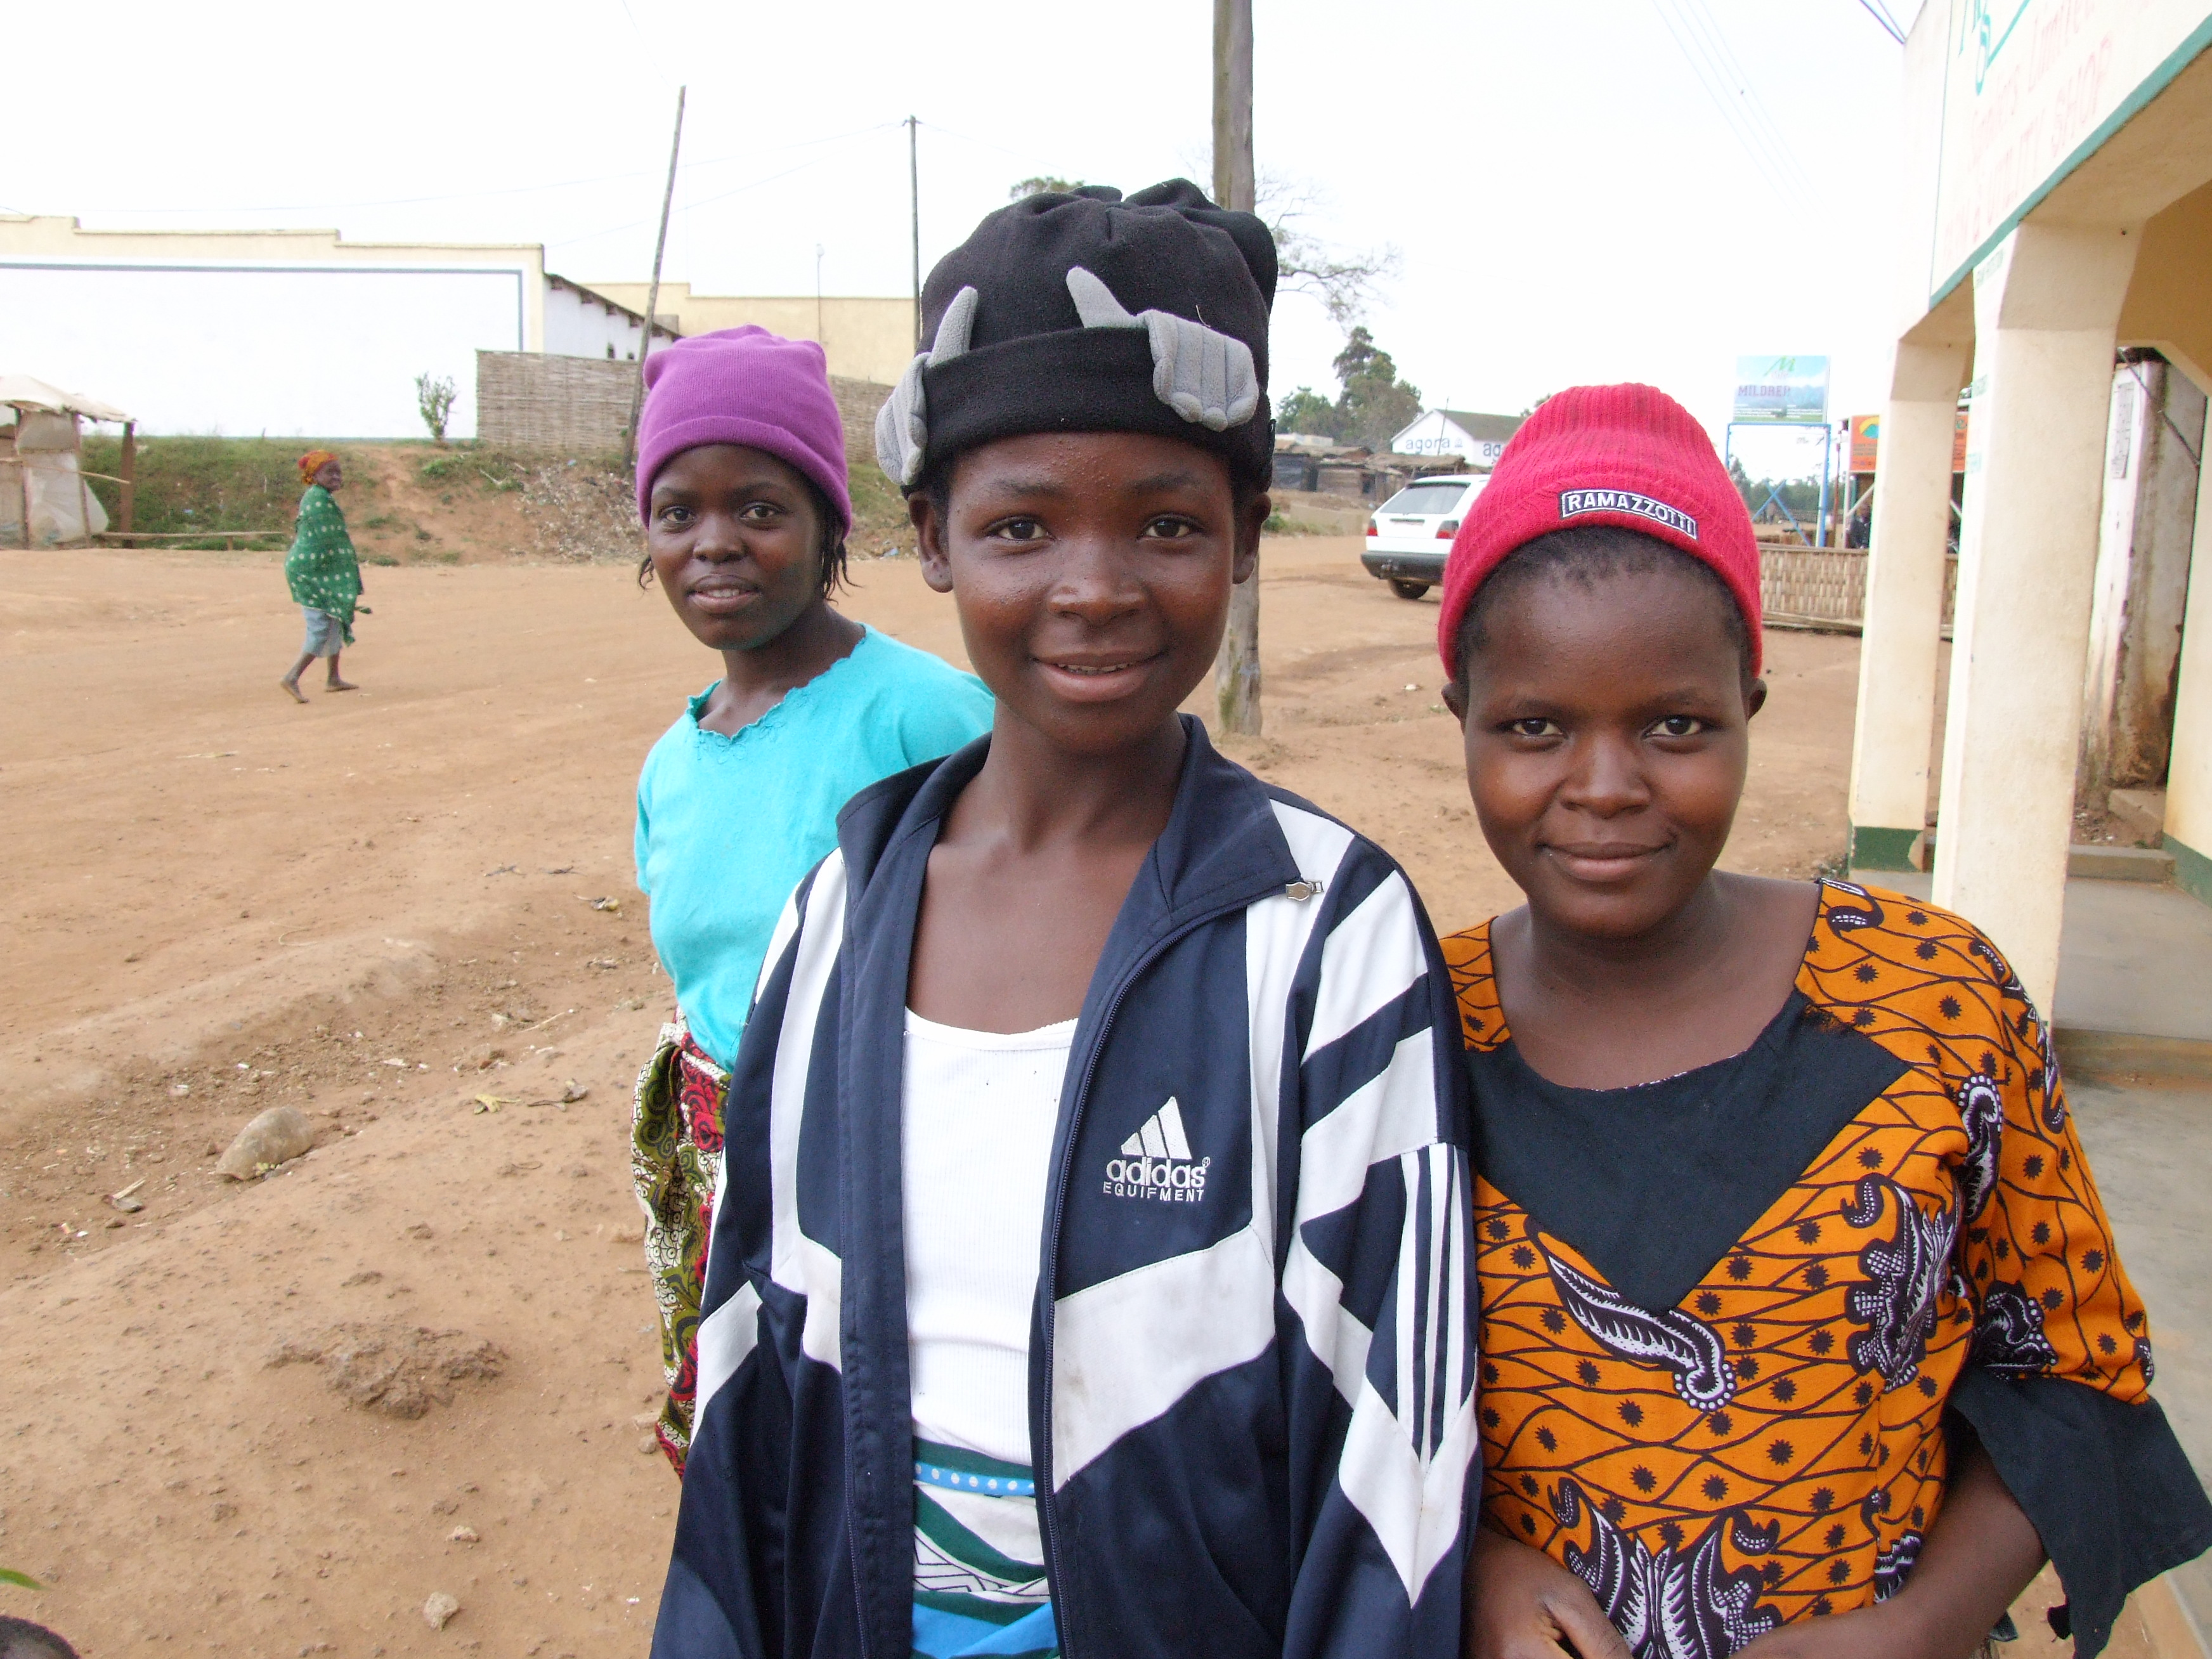 Malawi ladies